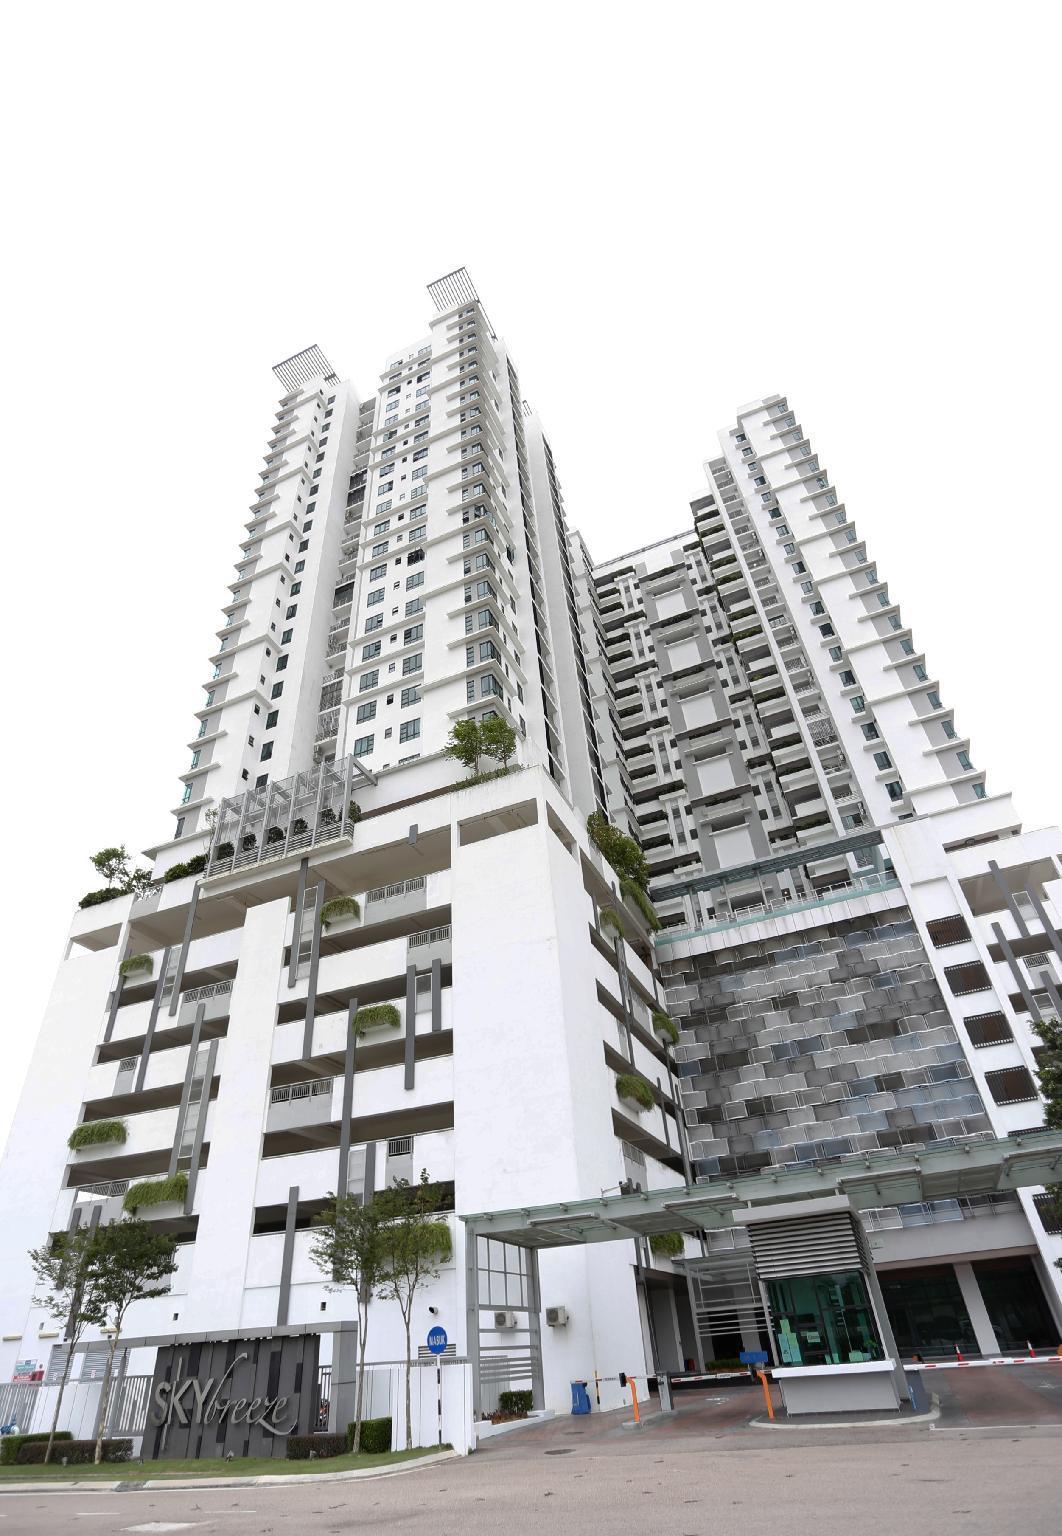 Sky Breeze Apartment, Johor Bahru